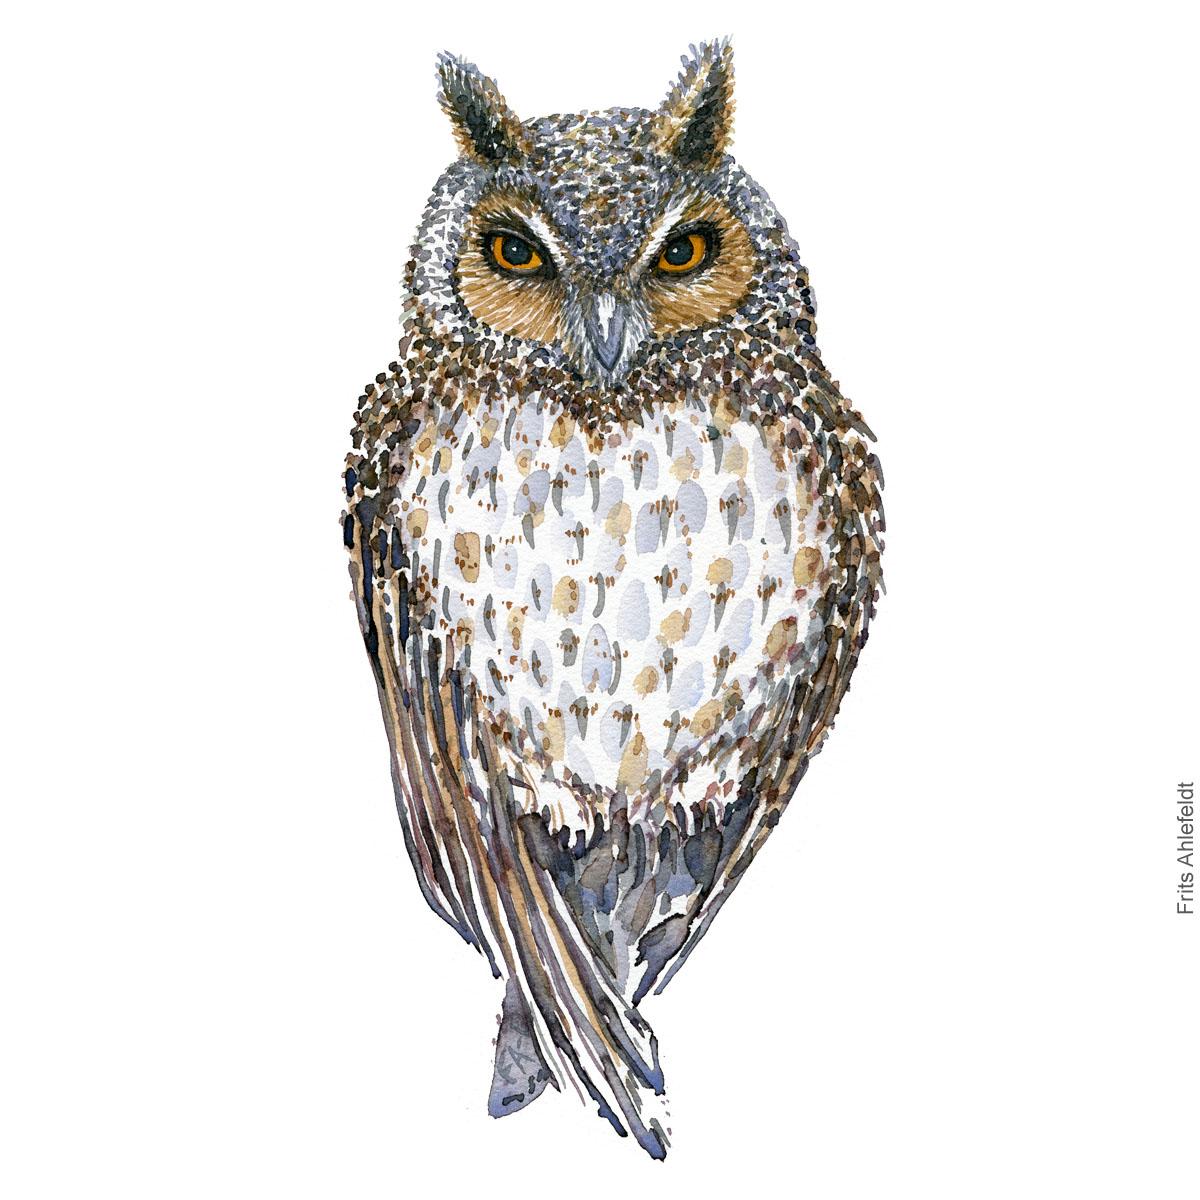 Skovhornsugle - Long eared owl - Bird watercolor painting. Artwork by Frits Ahlefeldt. Fugle akvarel